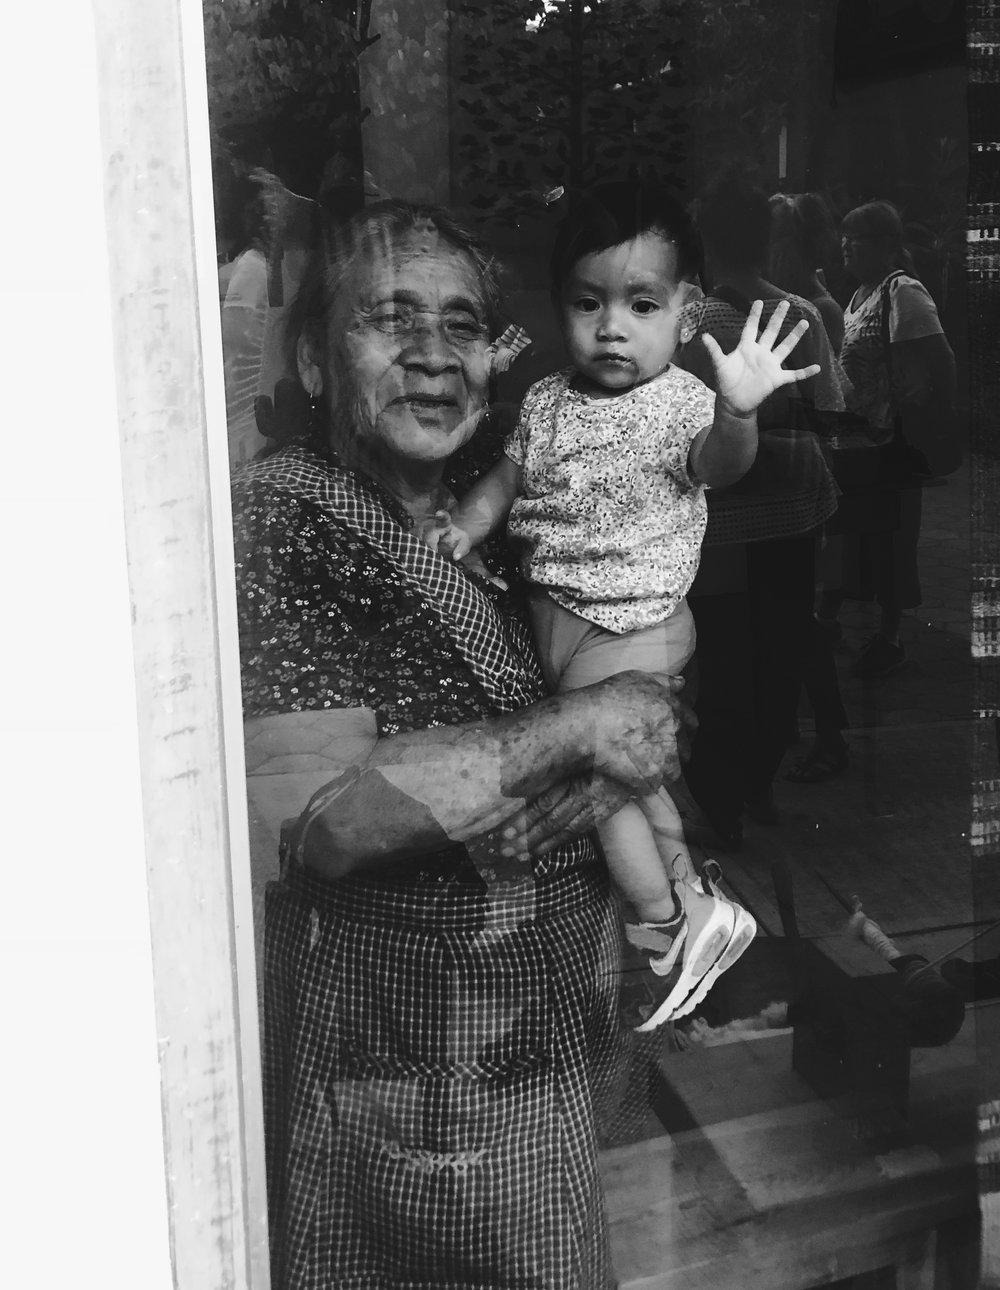 Famous Oaxacan candlemaker, Viviana Alavez and her granddaughter.